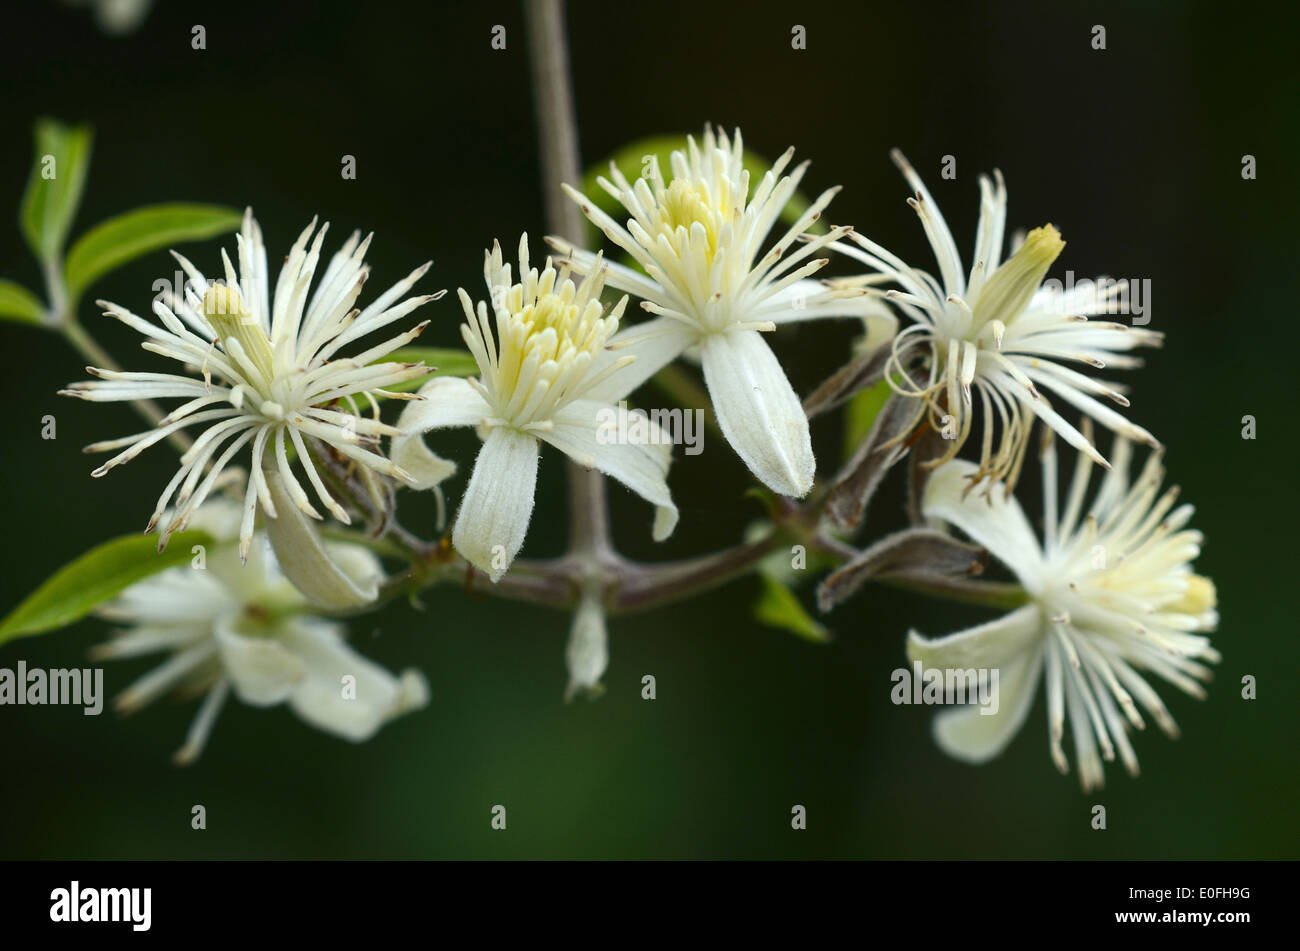 traveller's joy clematis vitalba perennial climber - Stock Image